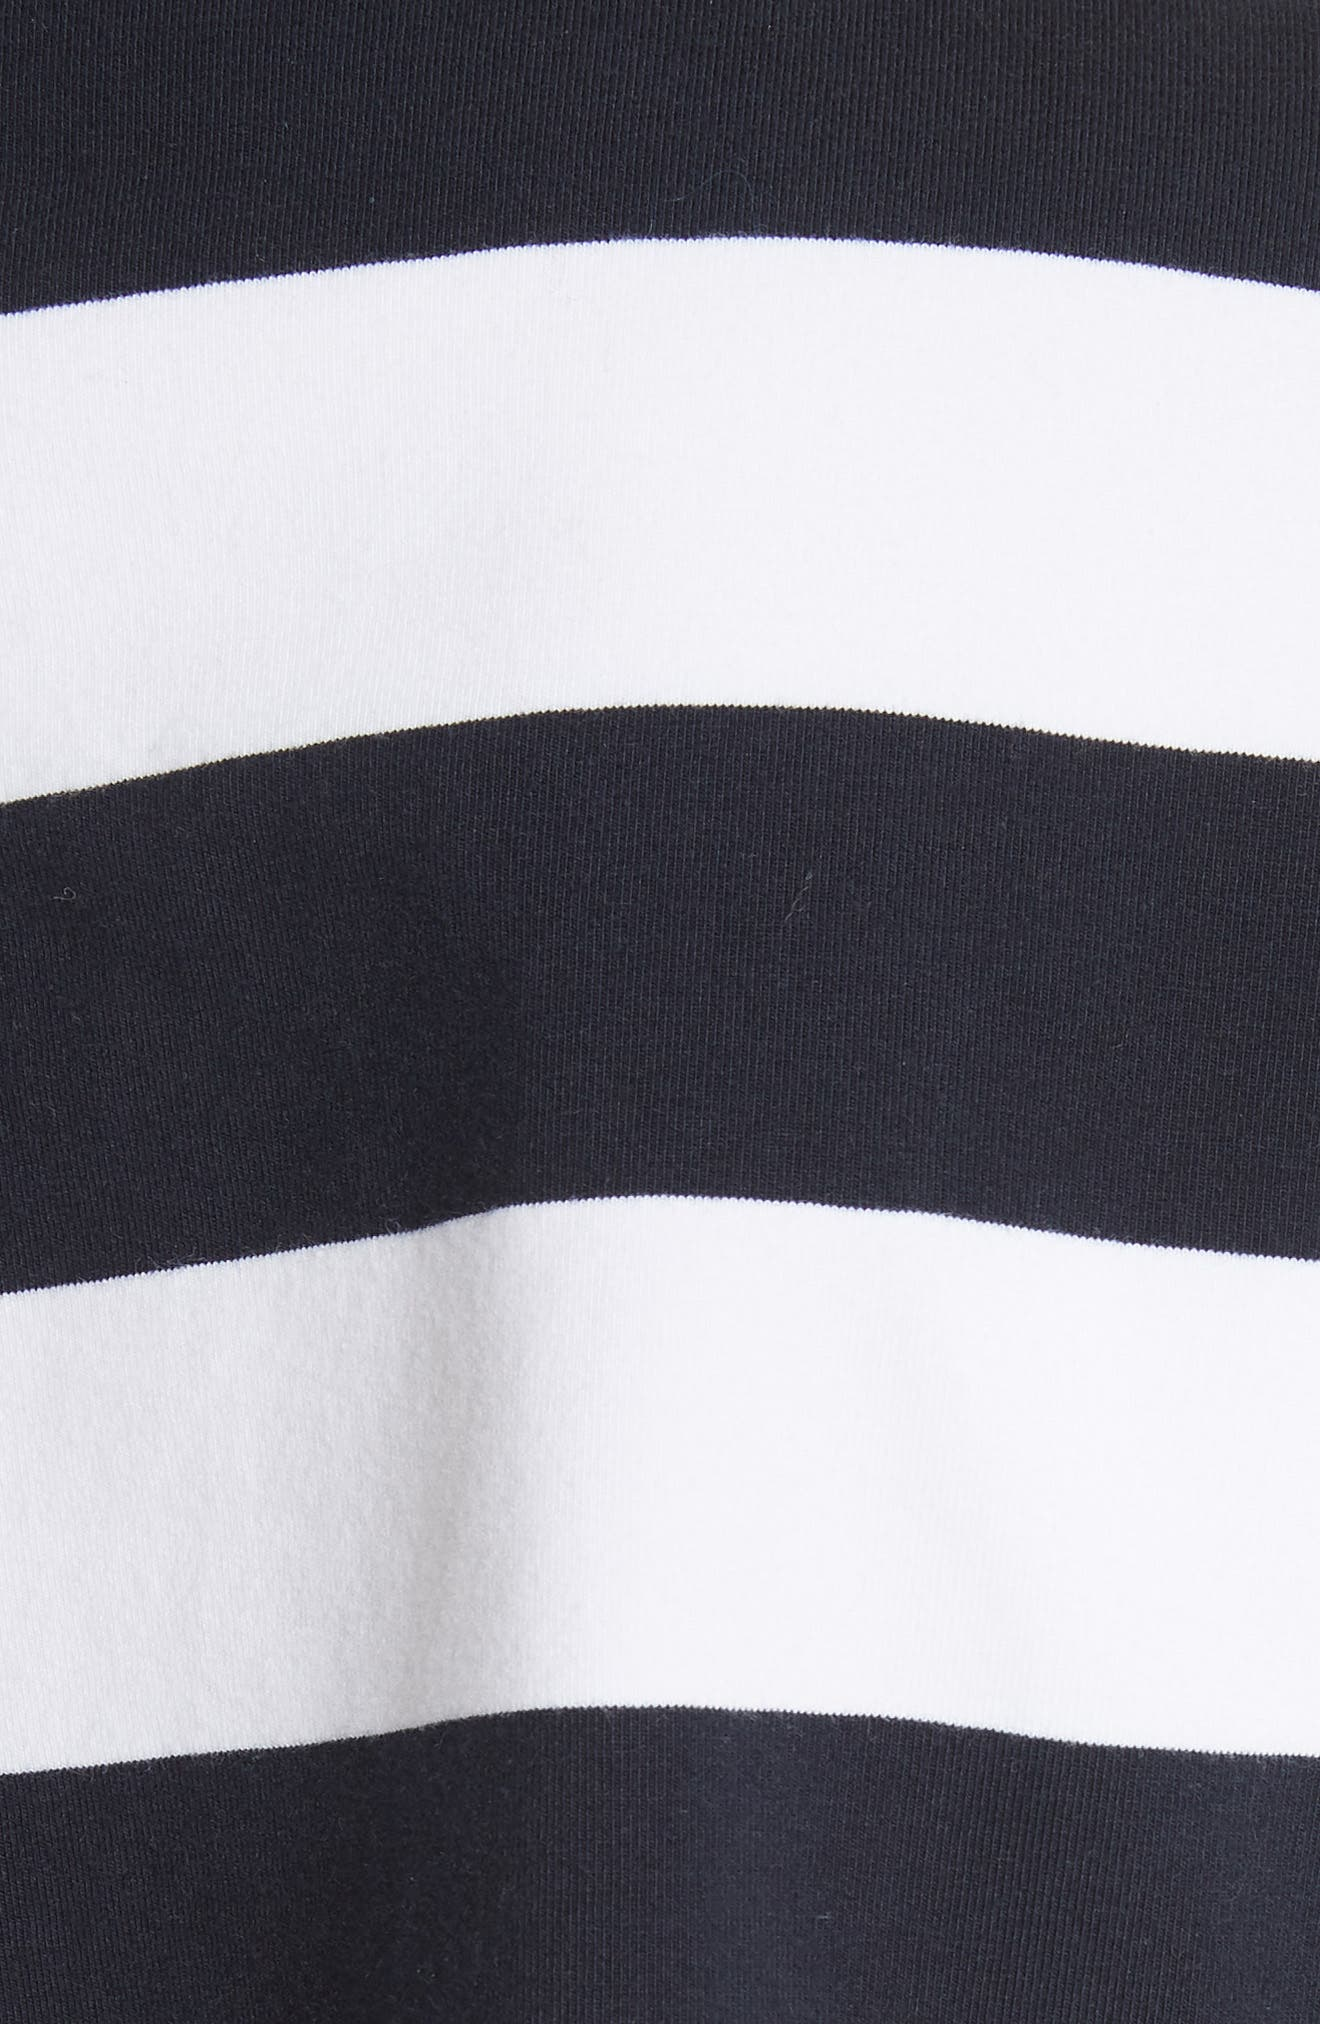 Long Sleeve Stripe Tee,                             Alternate thumbnail 5, color,                             412